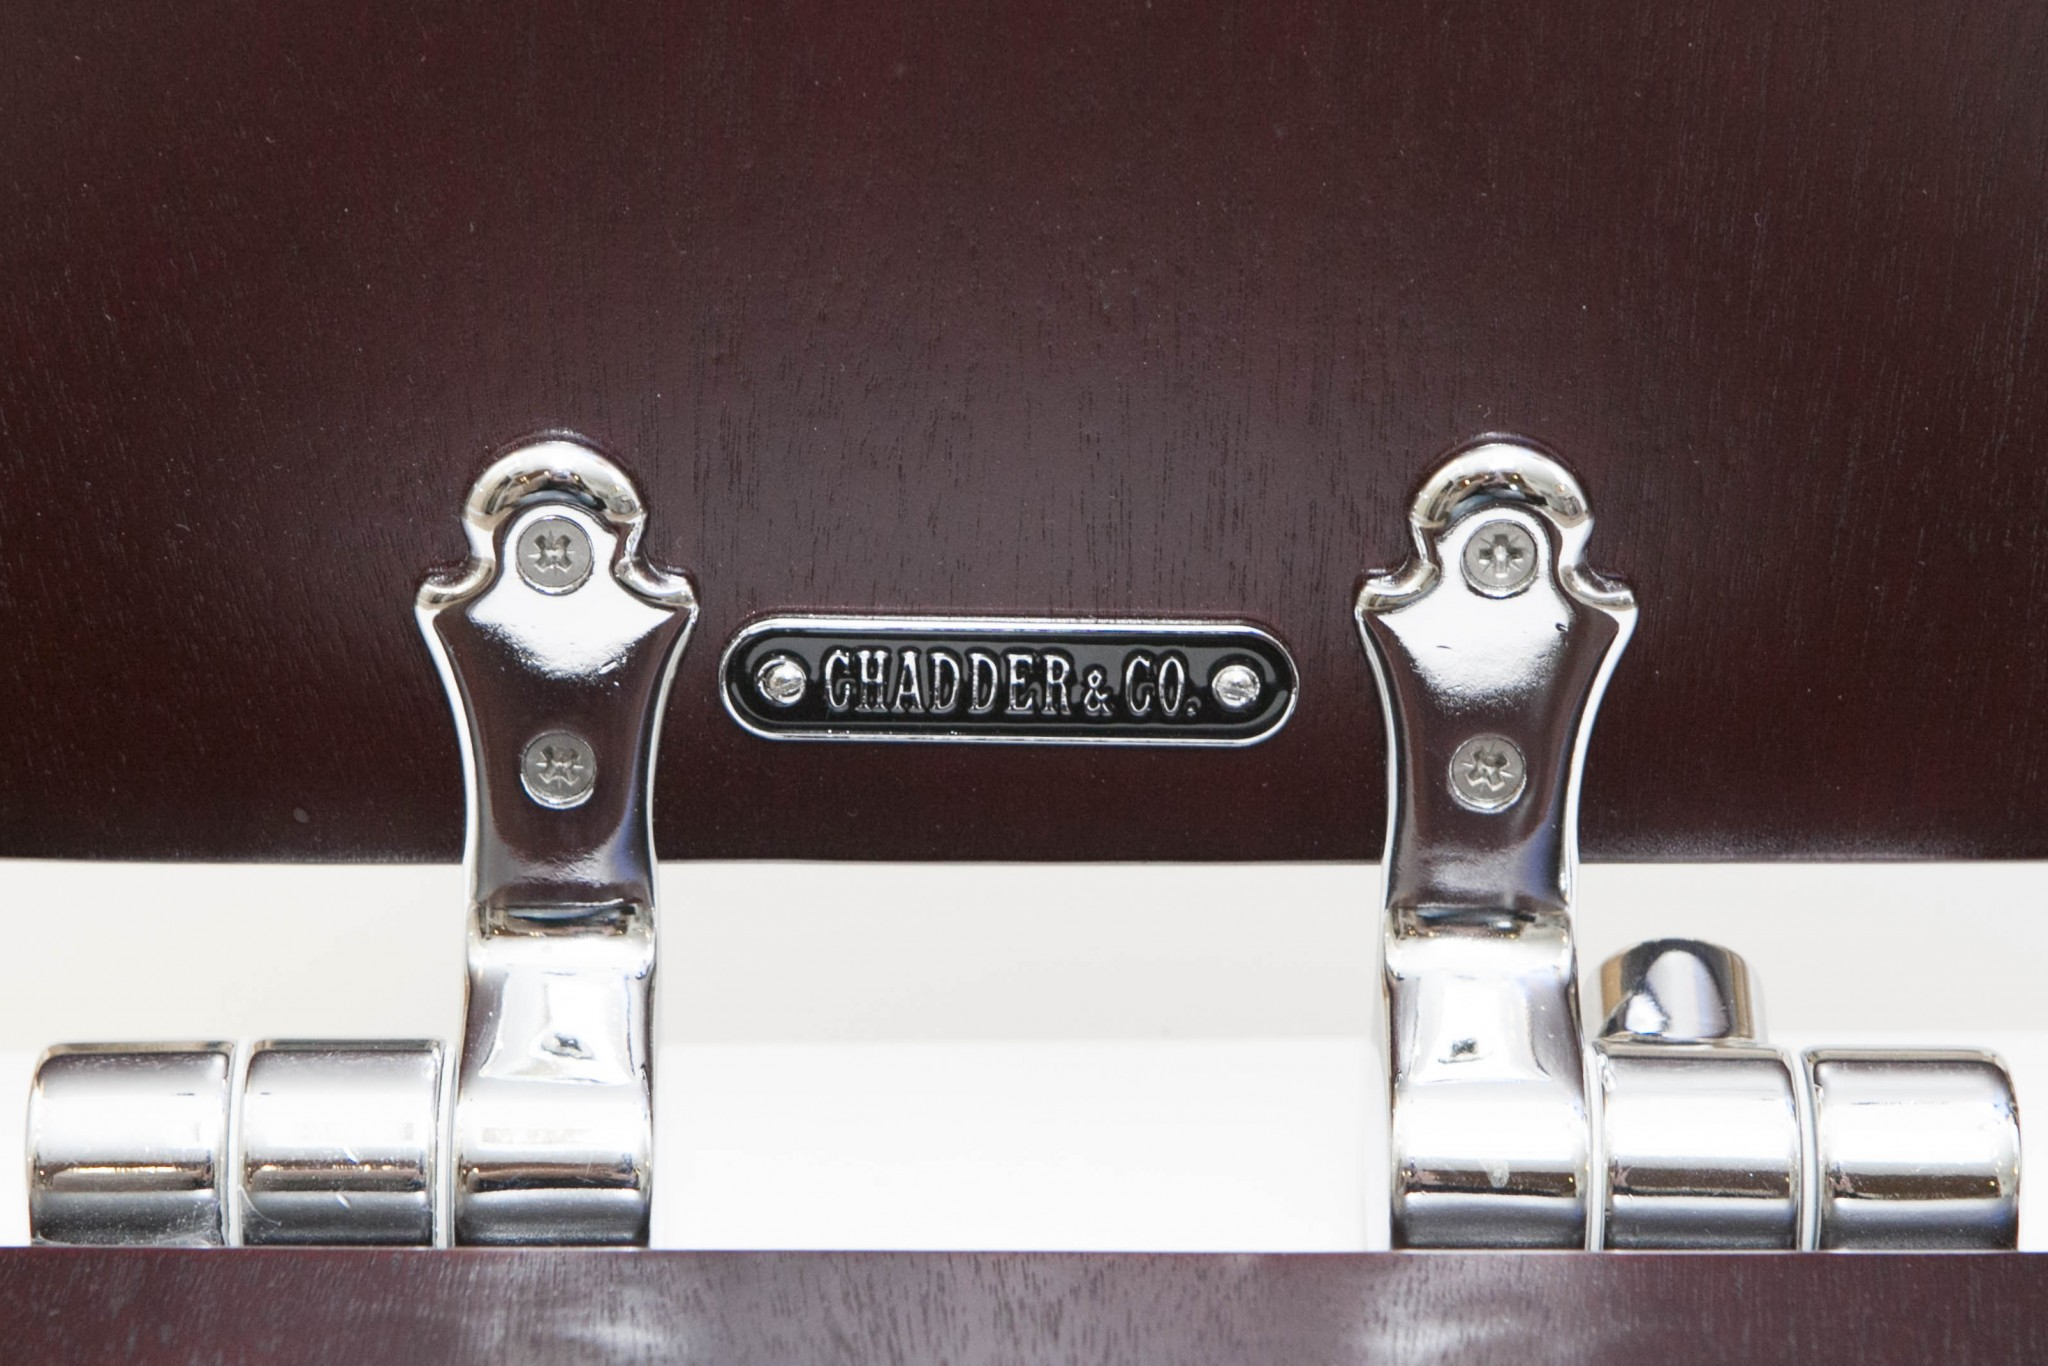 Chadder & Co. Badge